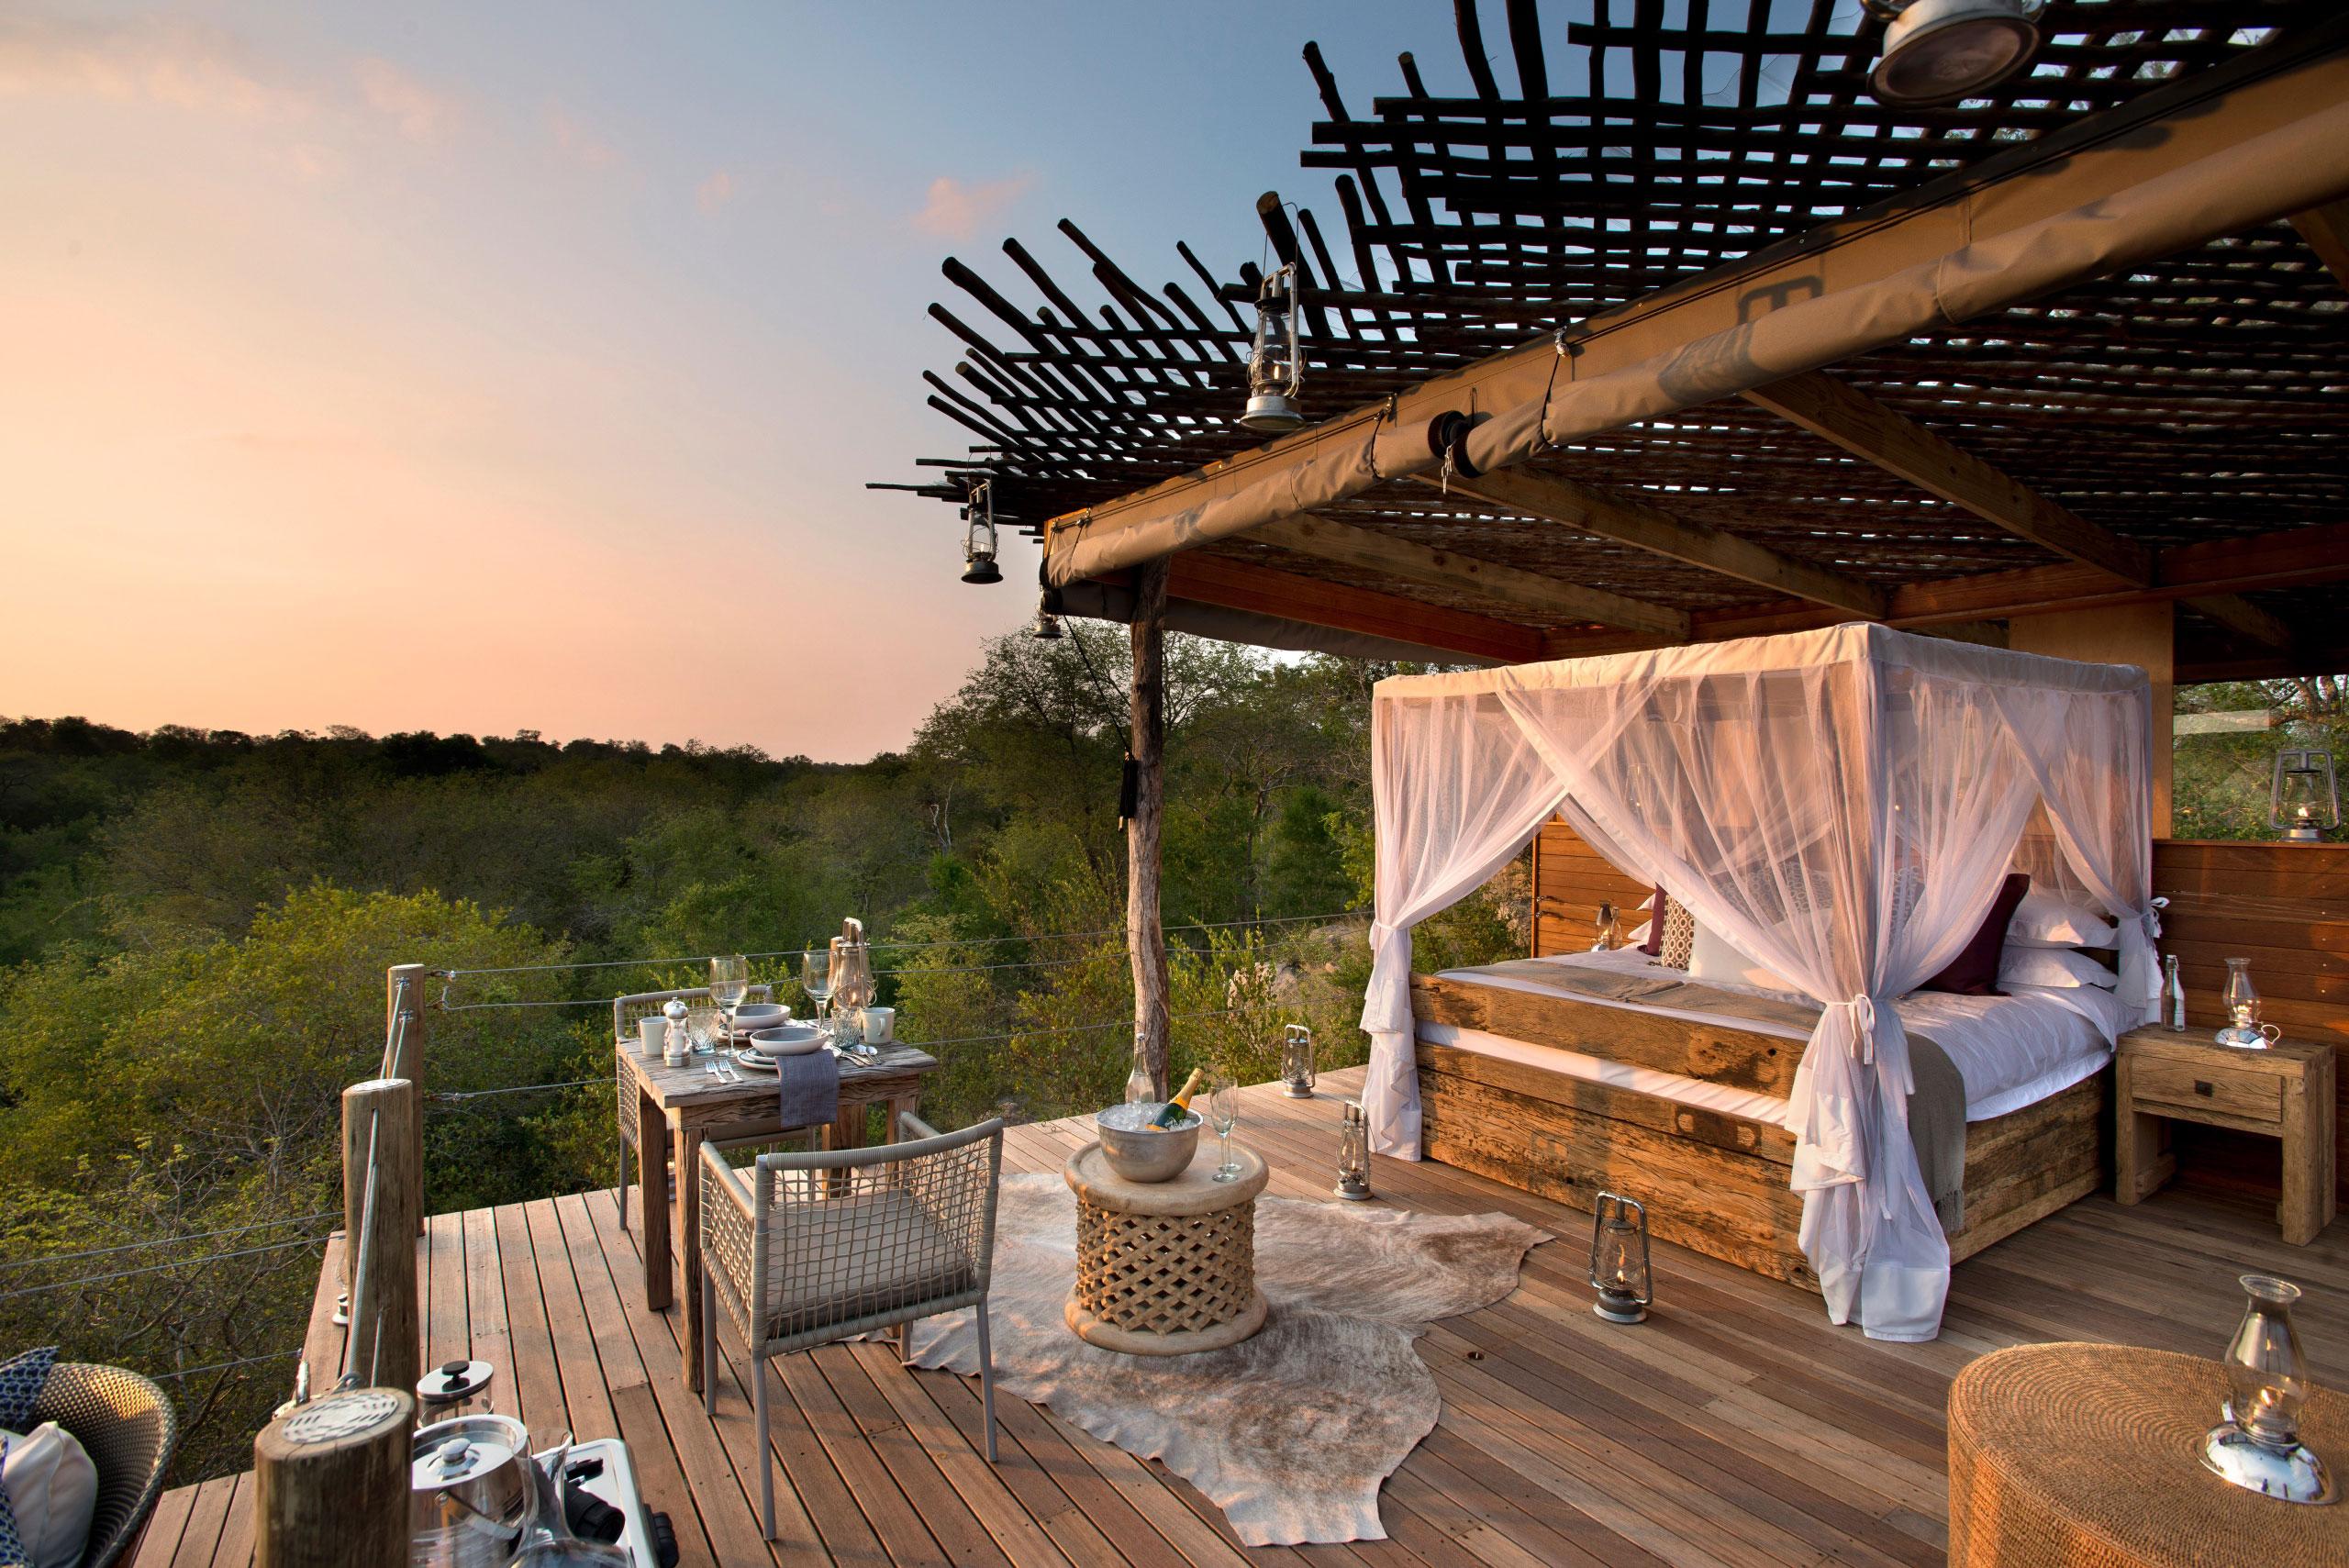 Alojamientos en Sudáfrica que nos han Sorprendido enkosi africa chalkley treehouse lion sands sabi sand safari 1